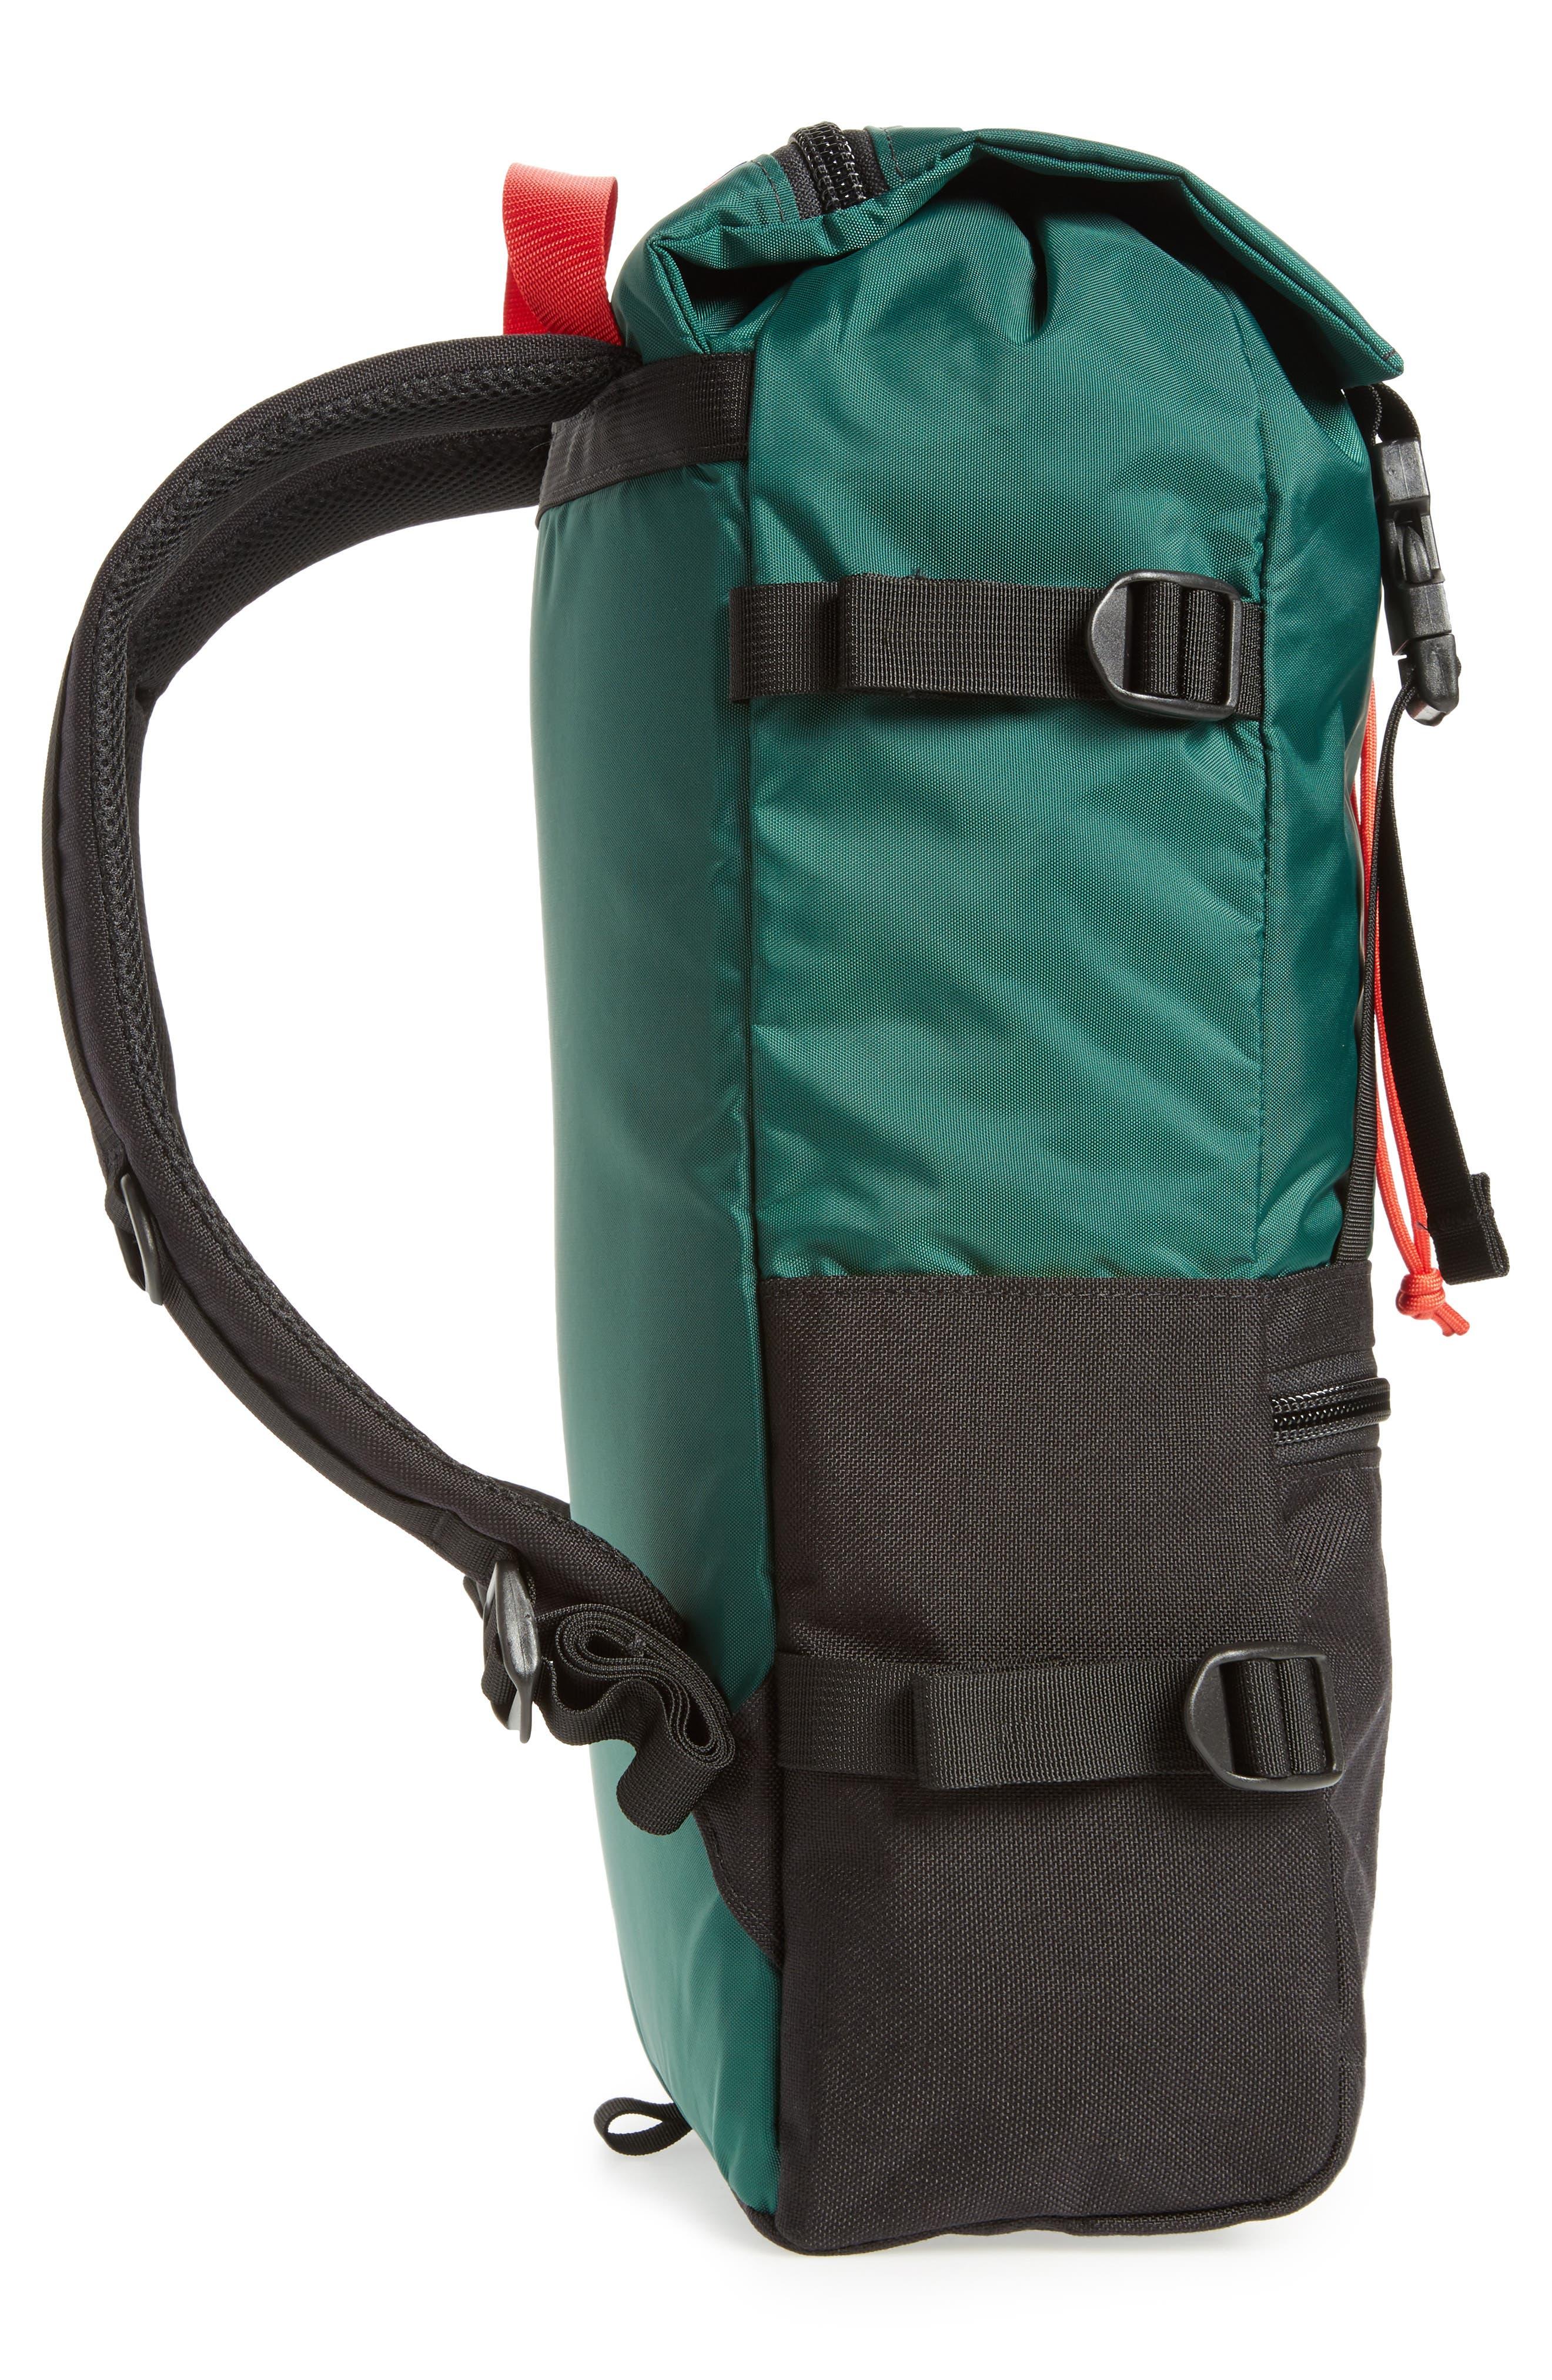 Rover Backpack,                             Alternate thumbnail 5, color,                             FOREST/ BLACK